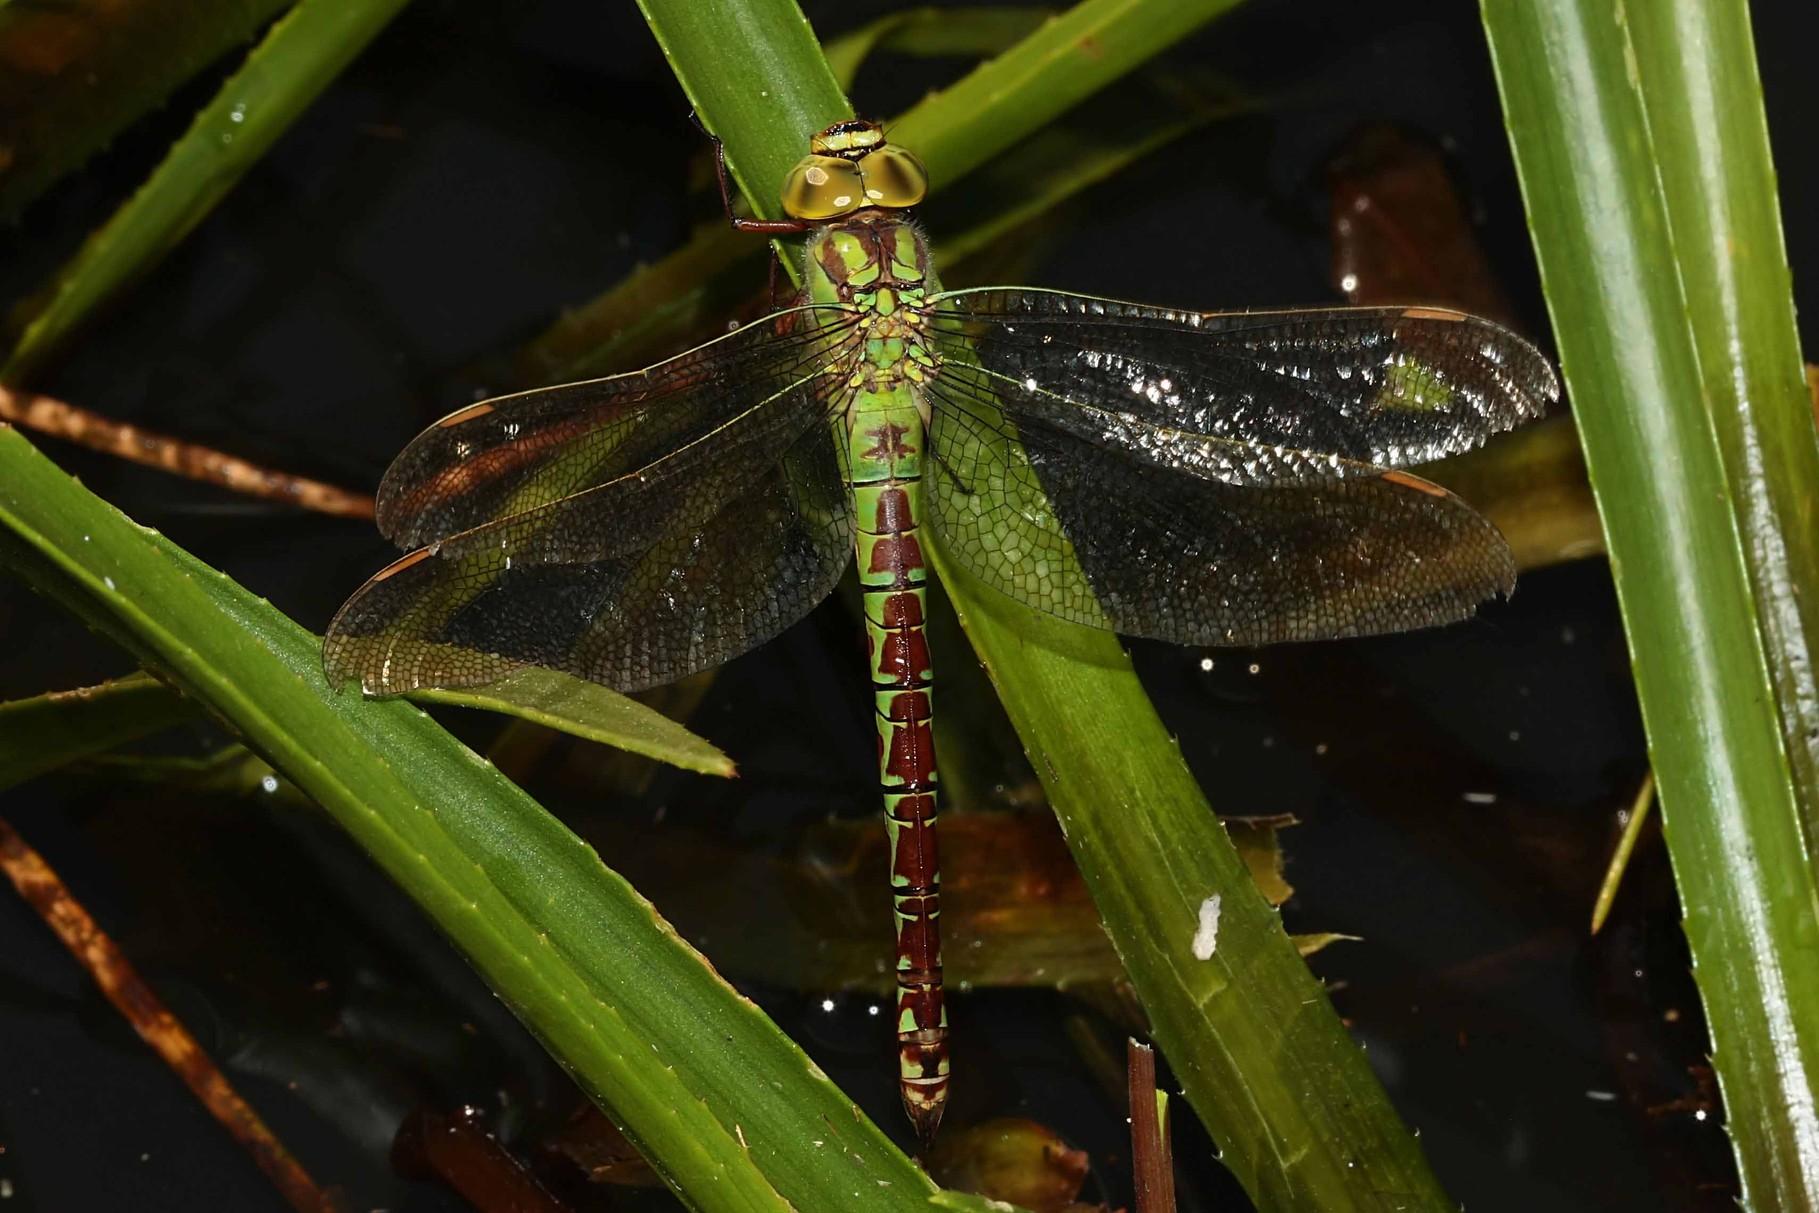 Grüne Mosaikjungfer, Aeshna viridis, Weibchen.